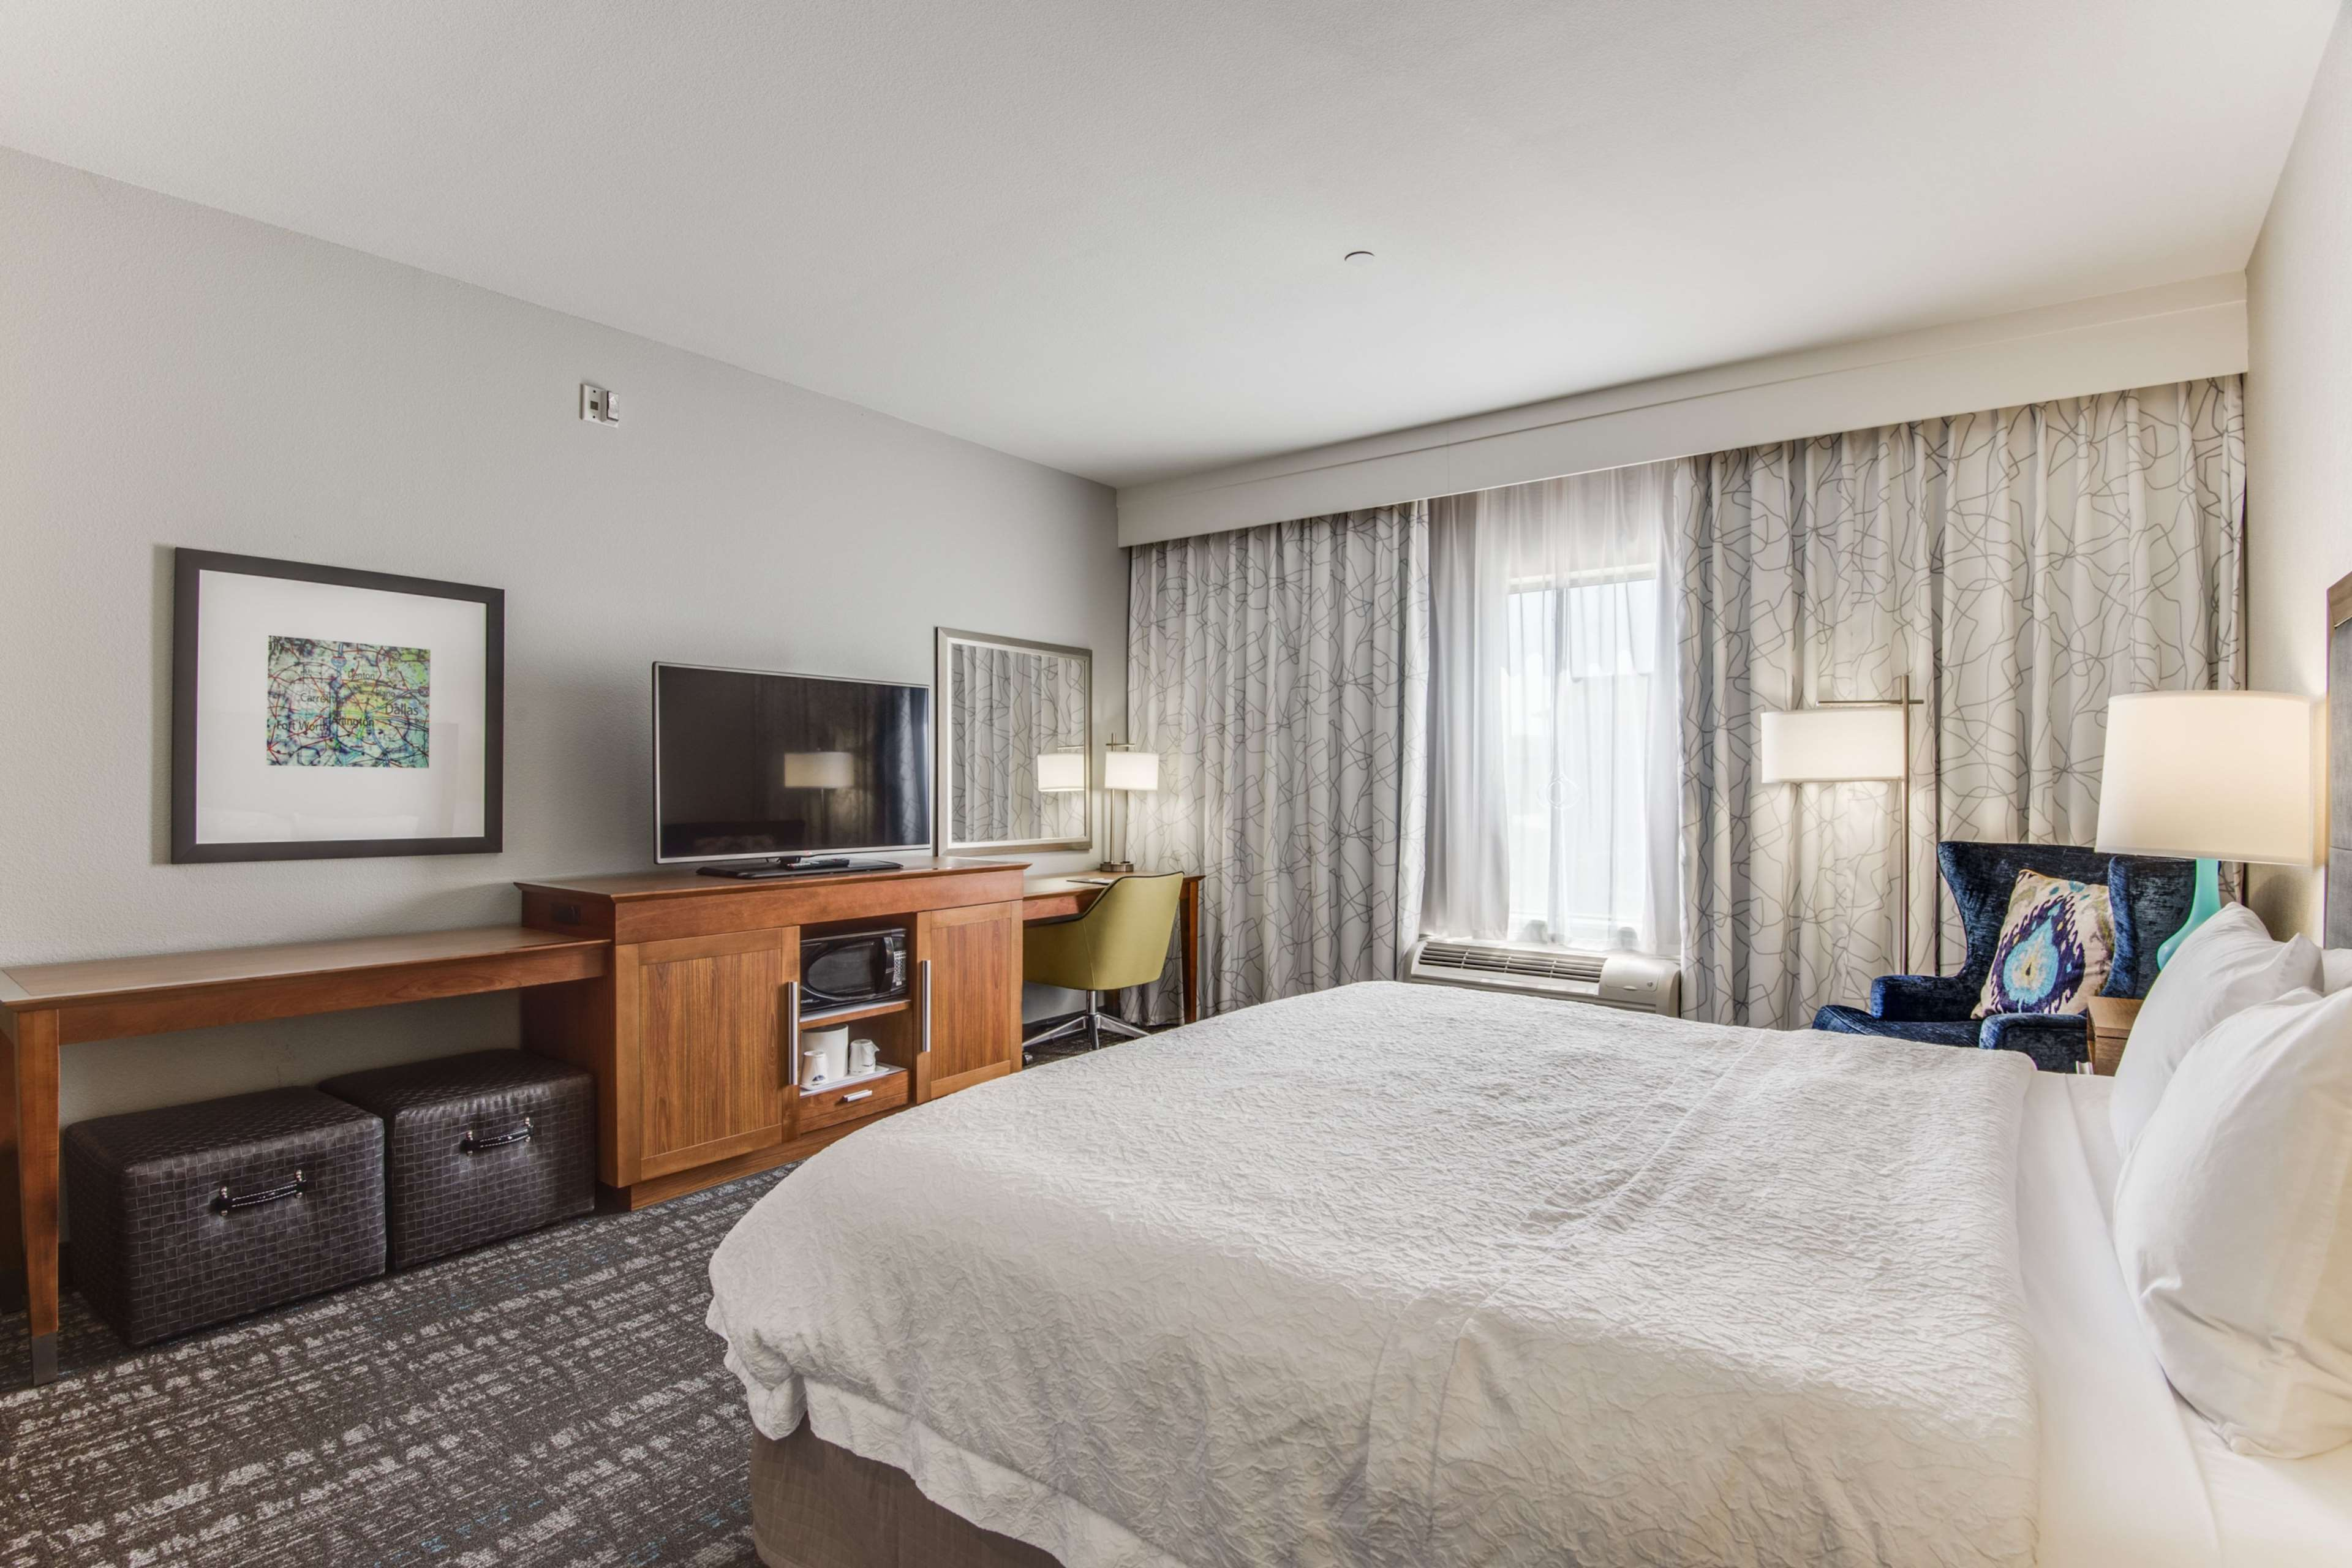 Hampton Inn & Suites Dallas/Ft. Worth Airport South image 21